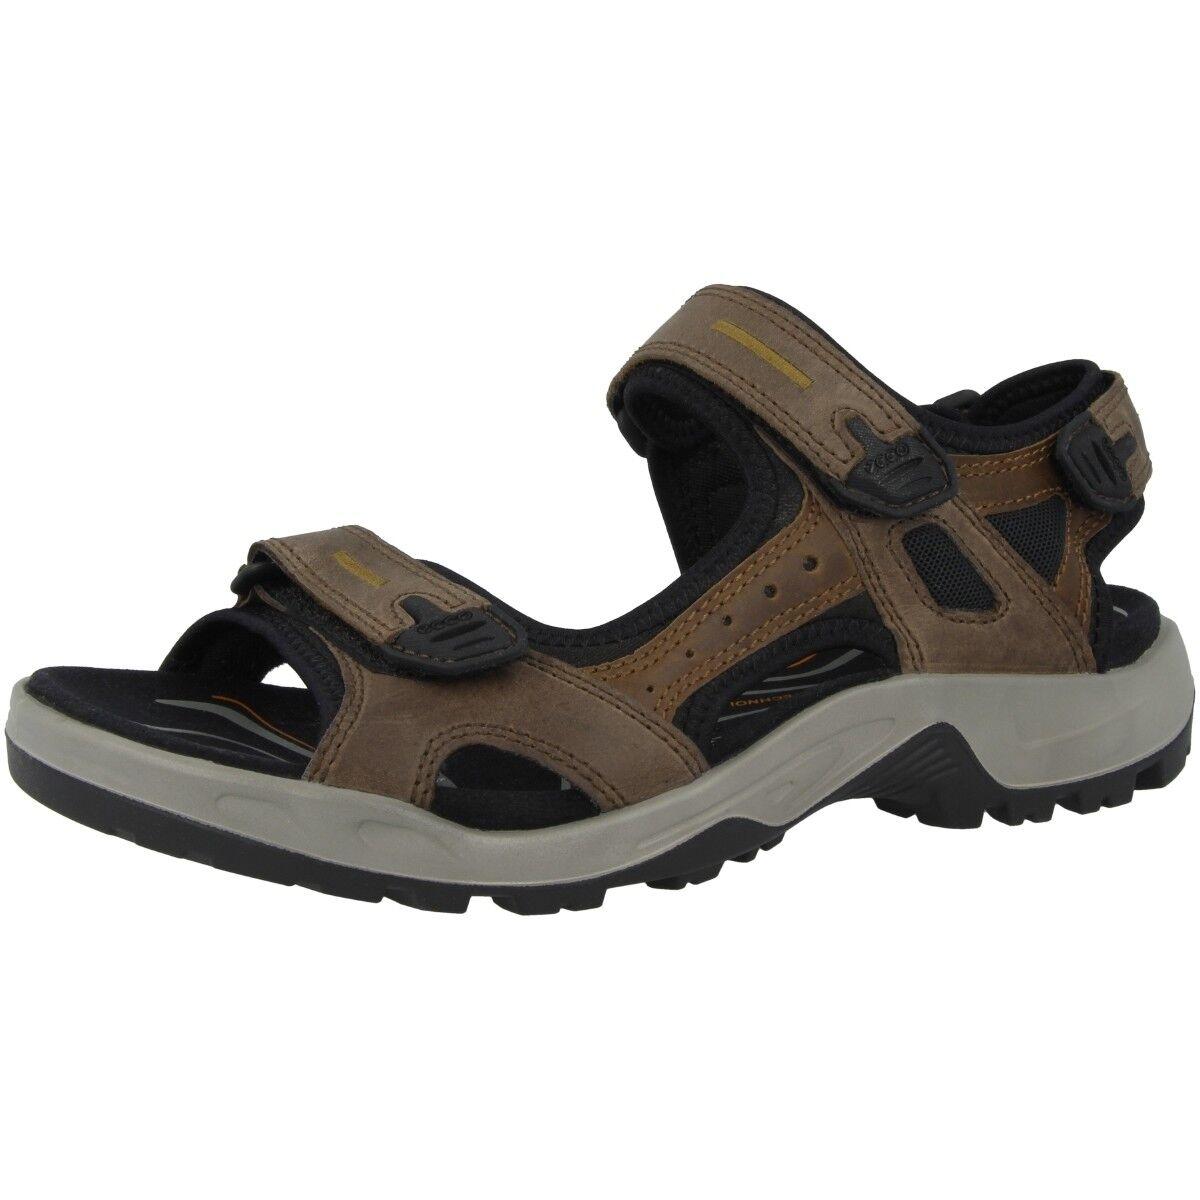 Ecco todoterreno Yucatan Men caballero zapatillas sandalia espresso 069564-56401 trekking